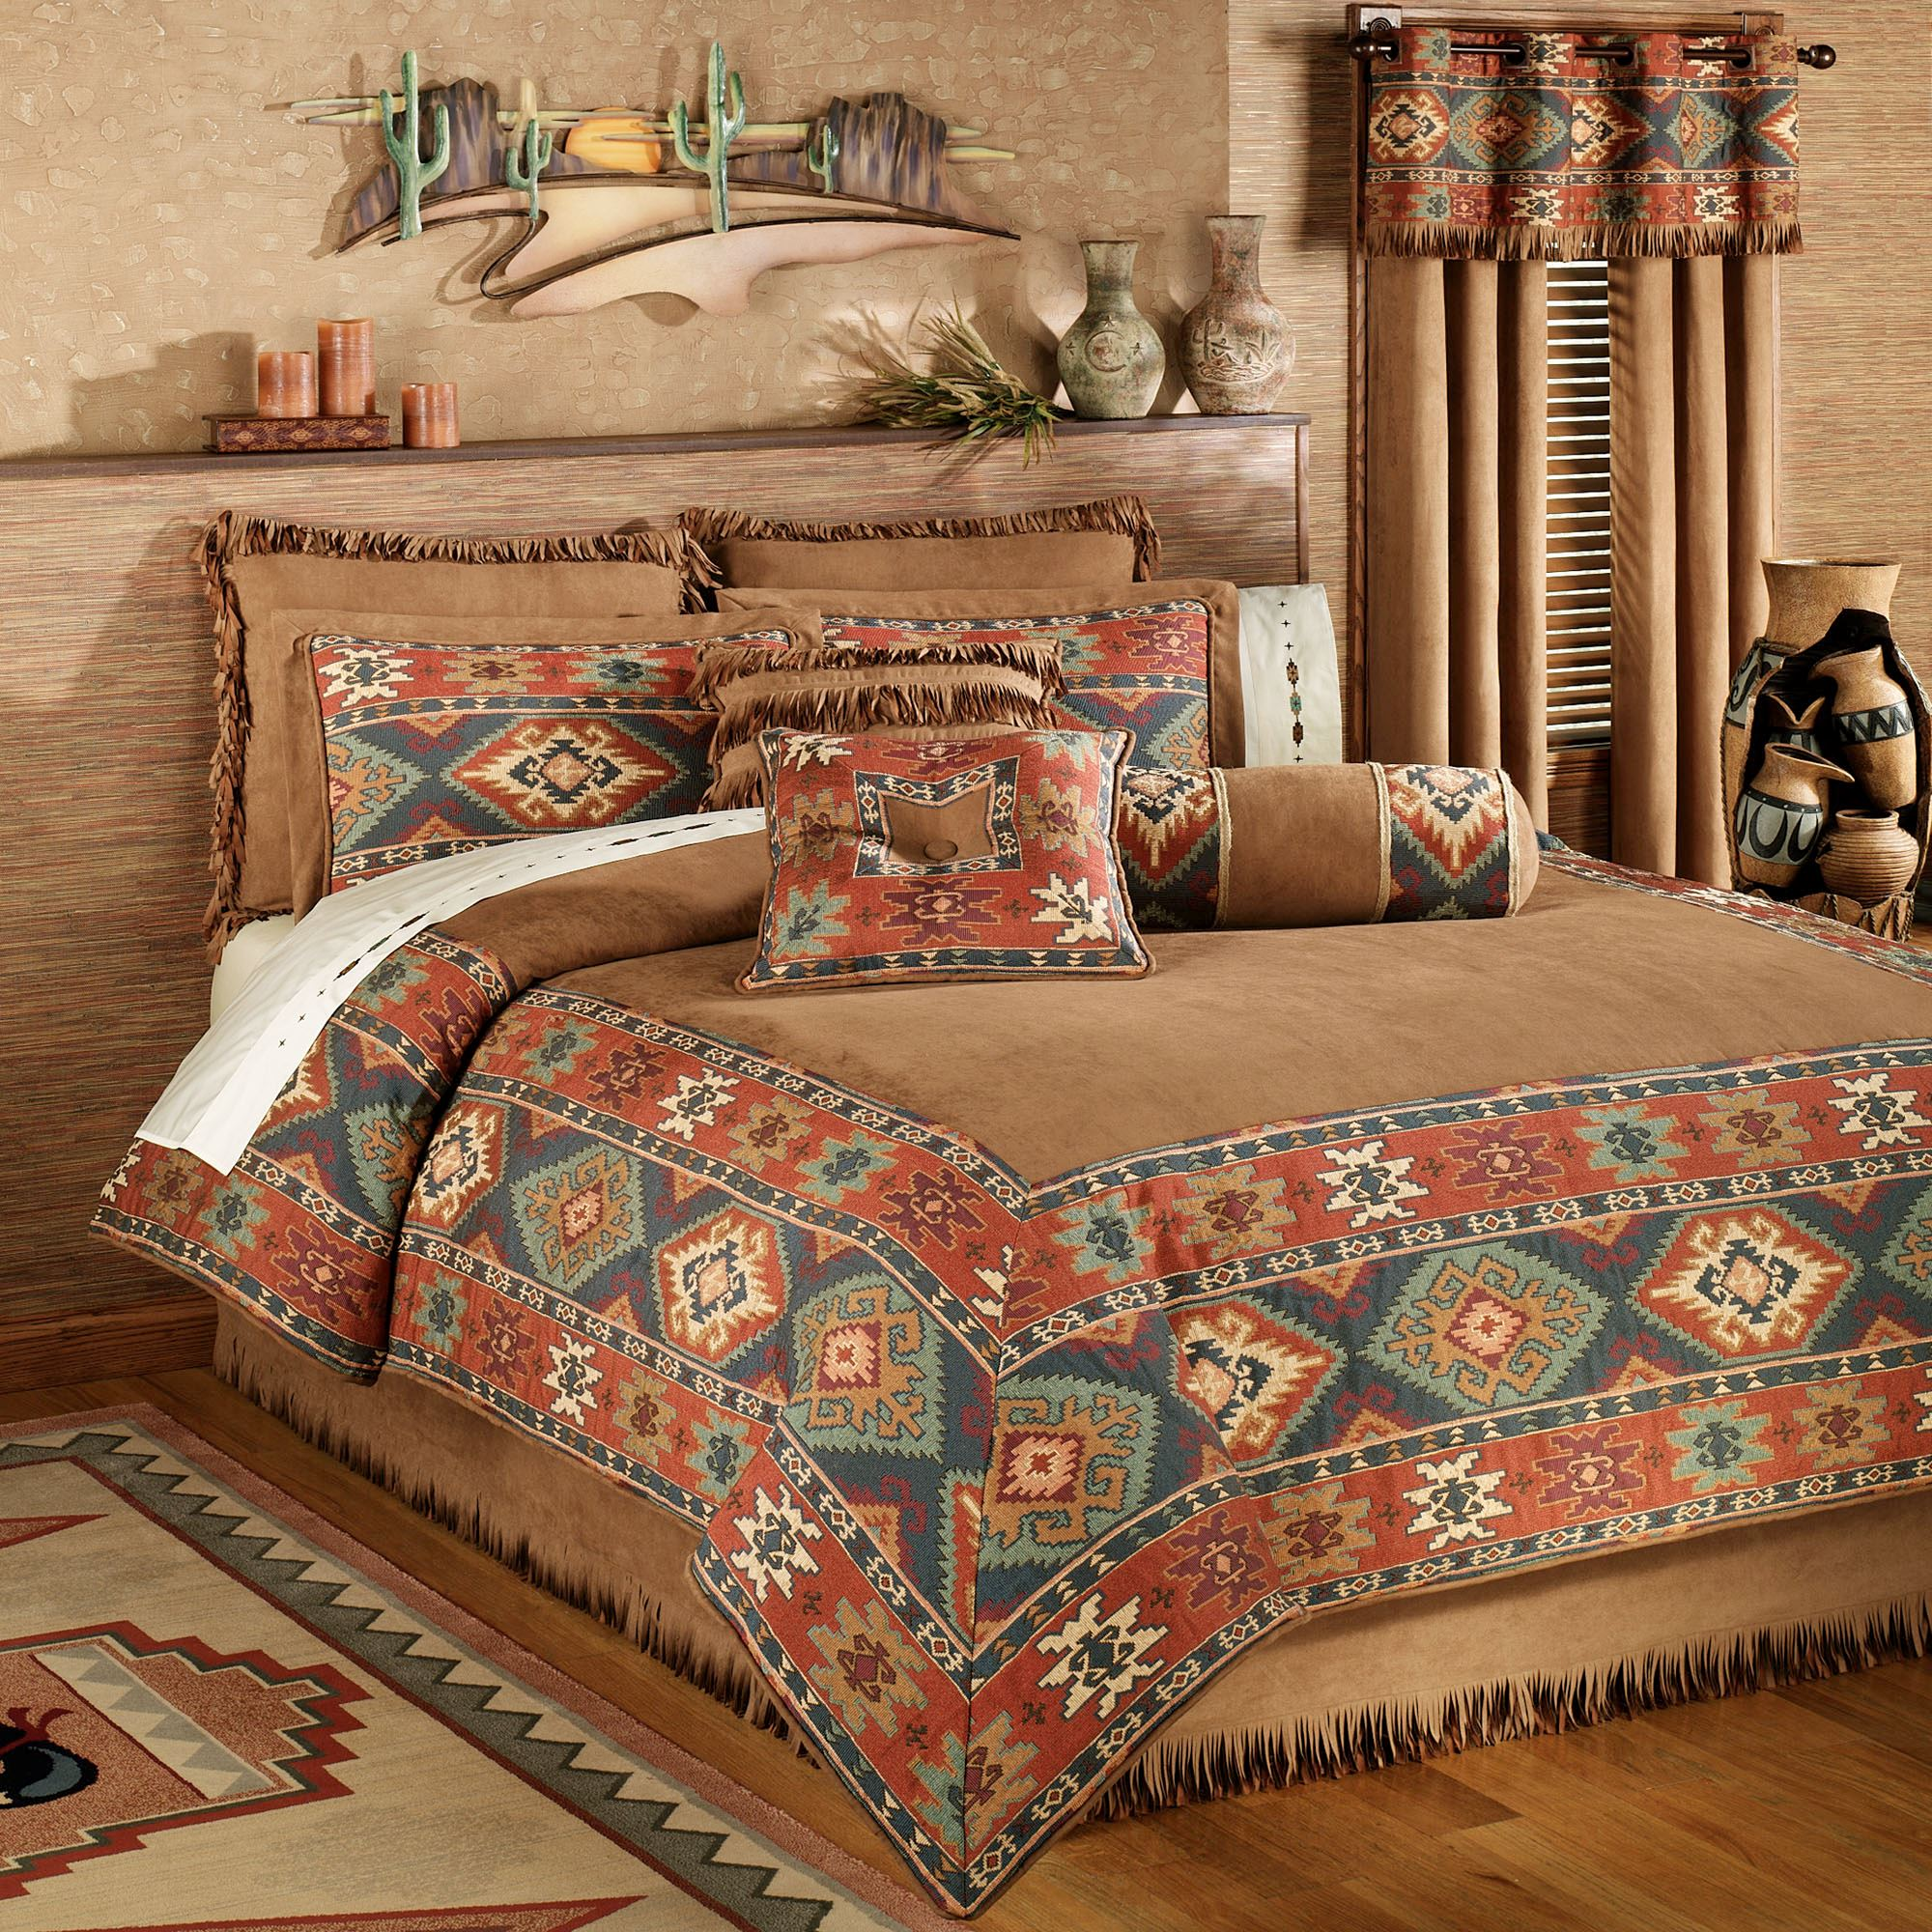 set bedding timber true ip comforter southwest walmart comforters southwestern com teal